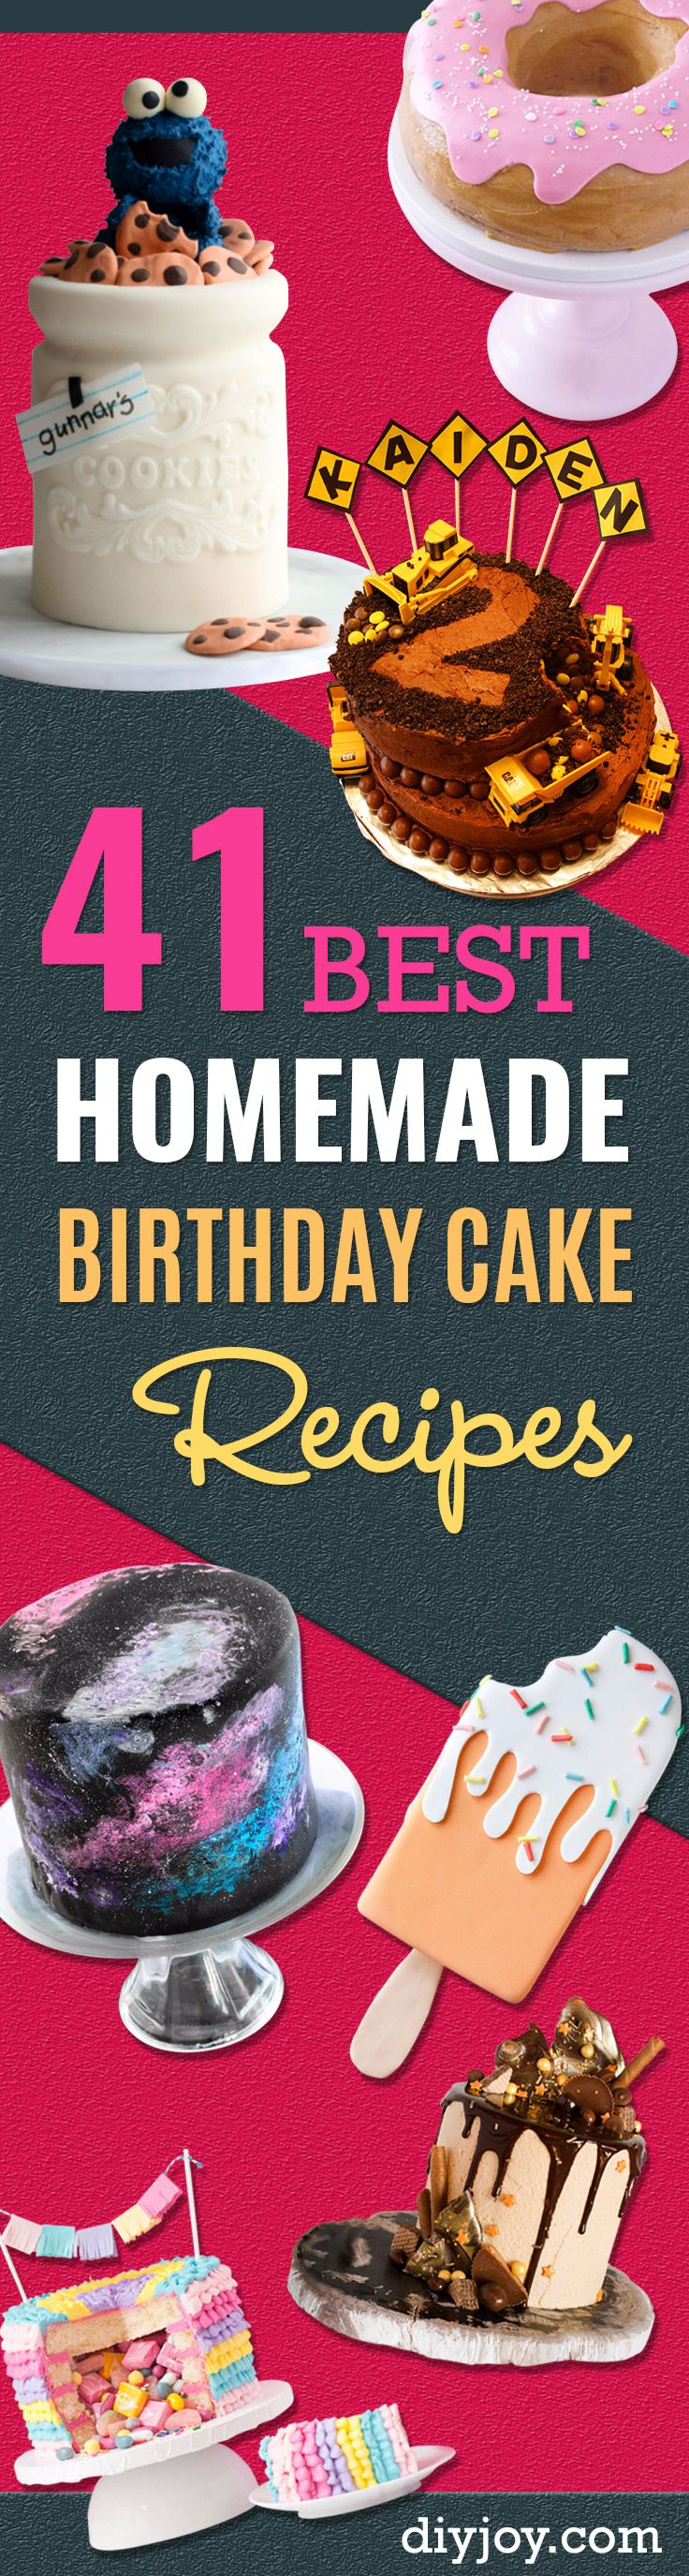 41 Best Homemade Birthday Cake Recipes - Birthday Cake Recipes From Scratch, Delicious Birthday Cake Recipes To Make, Quick And Easy Birthday Cake Recipes, Awesome Birthday Cake Ideas http://diyjoy.com/best-birthday-cake-recipes